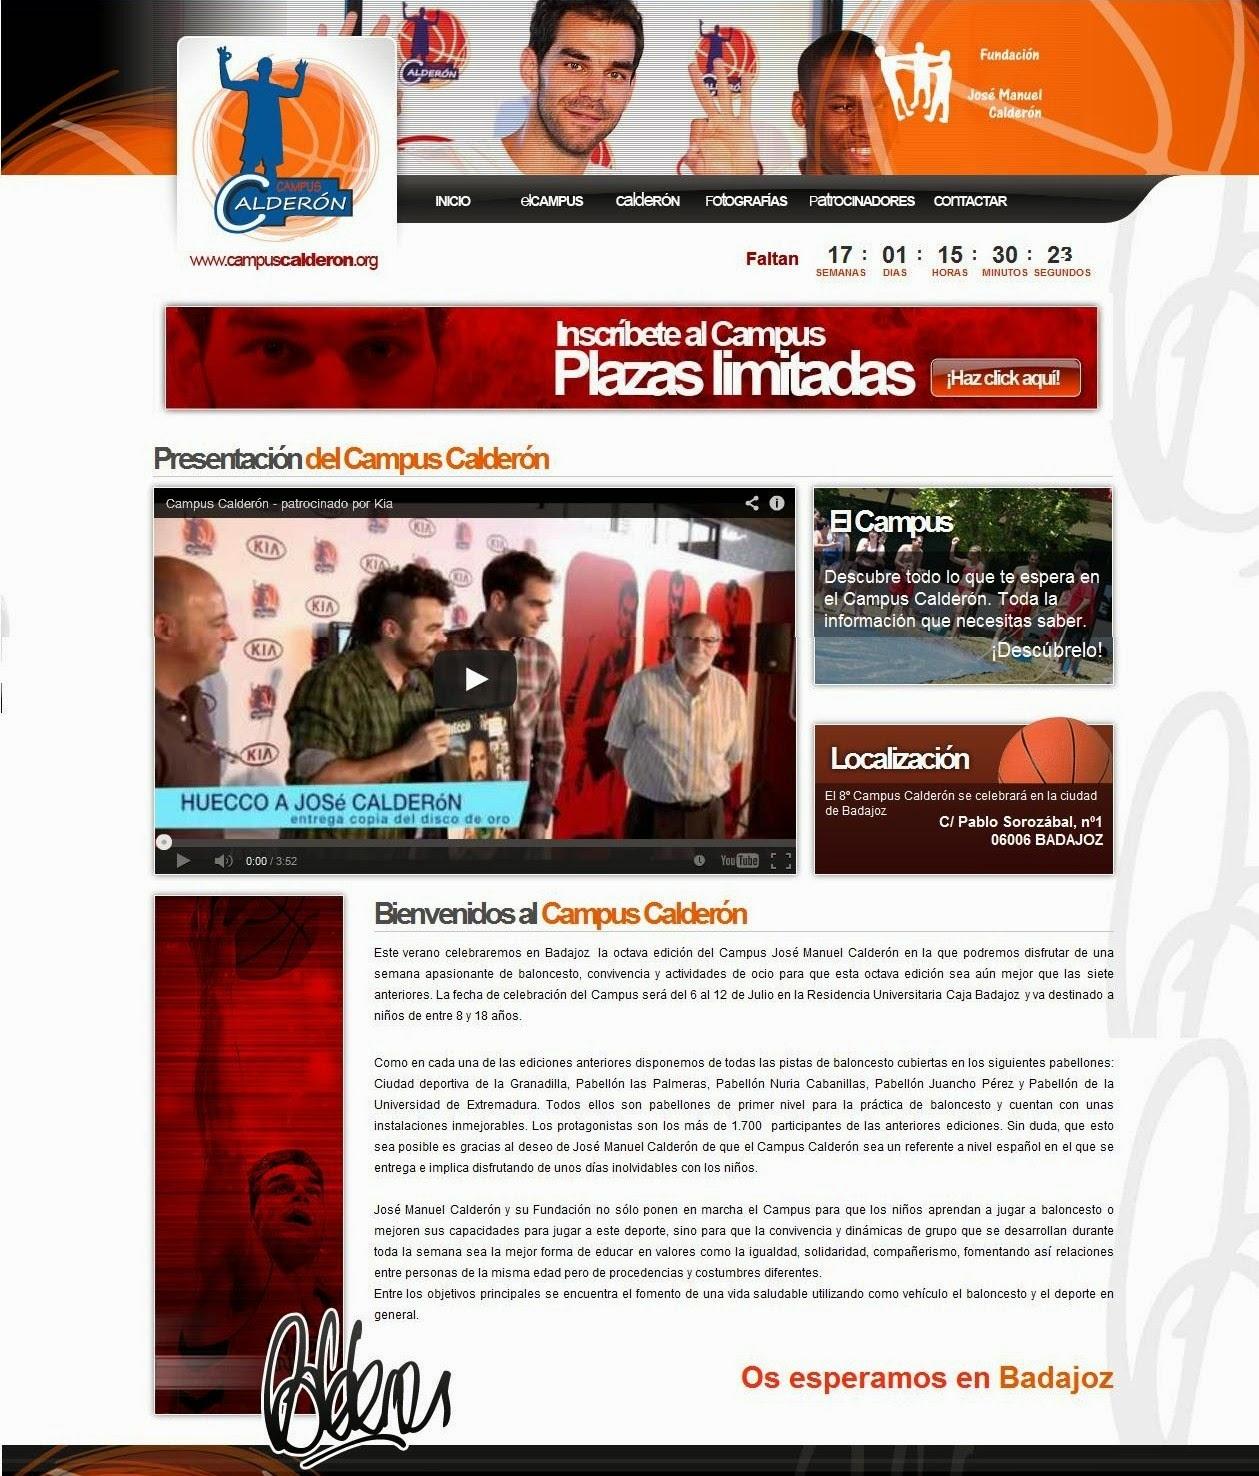 http://www.campuscalderon.org/